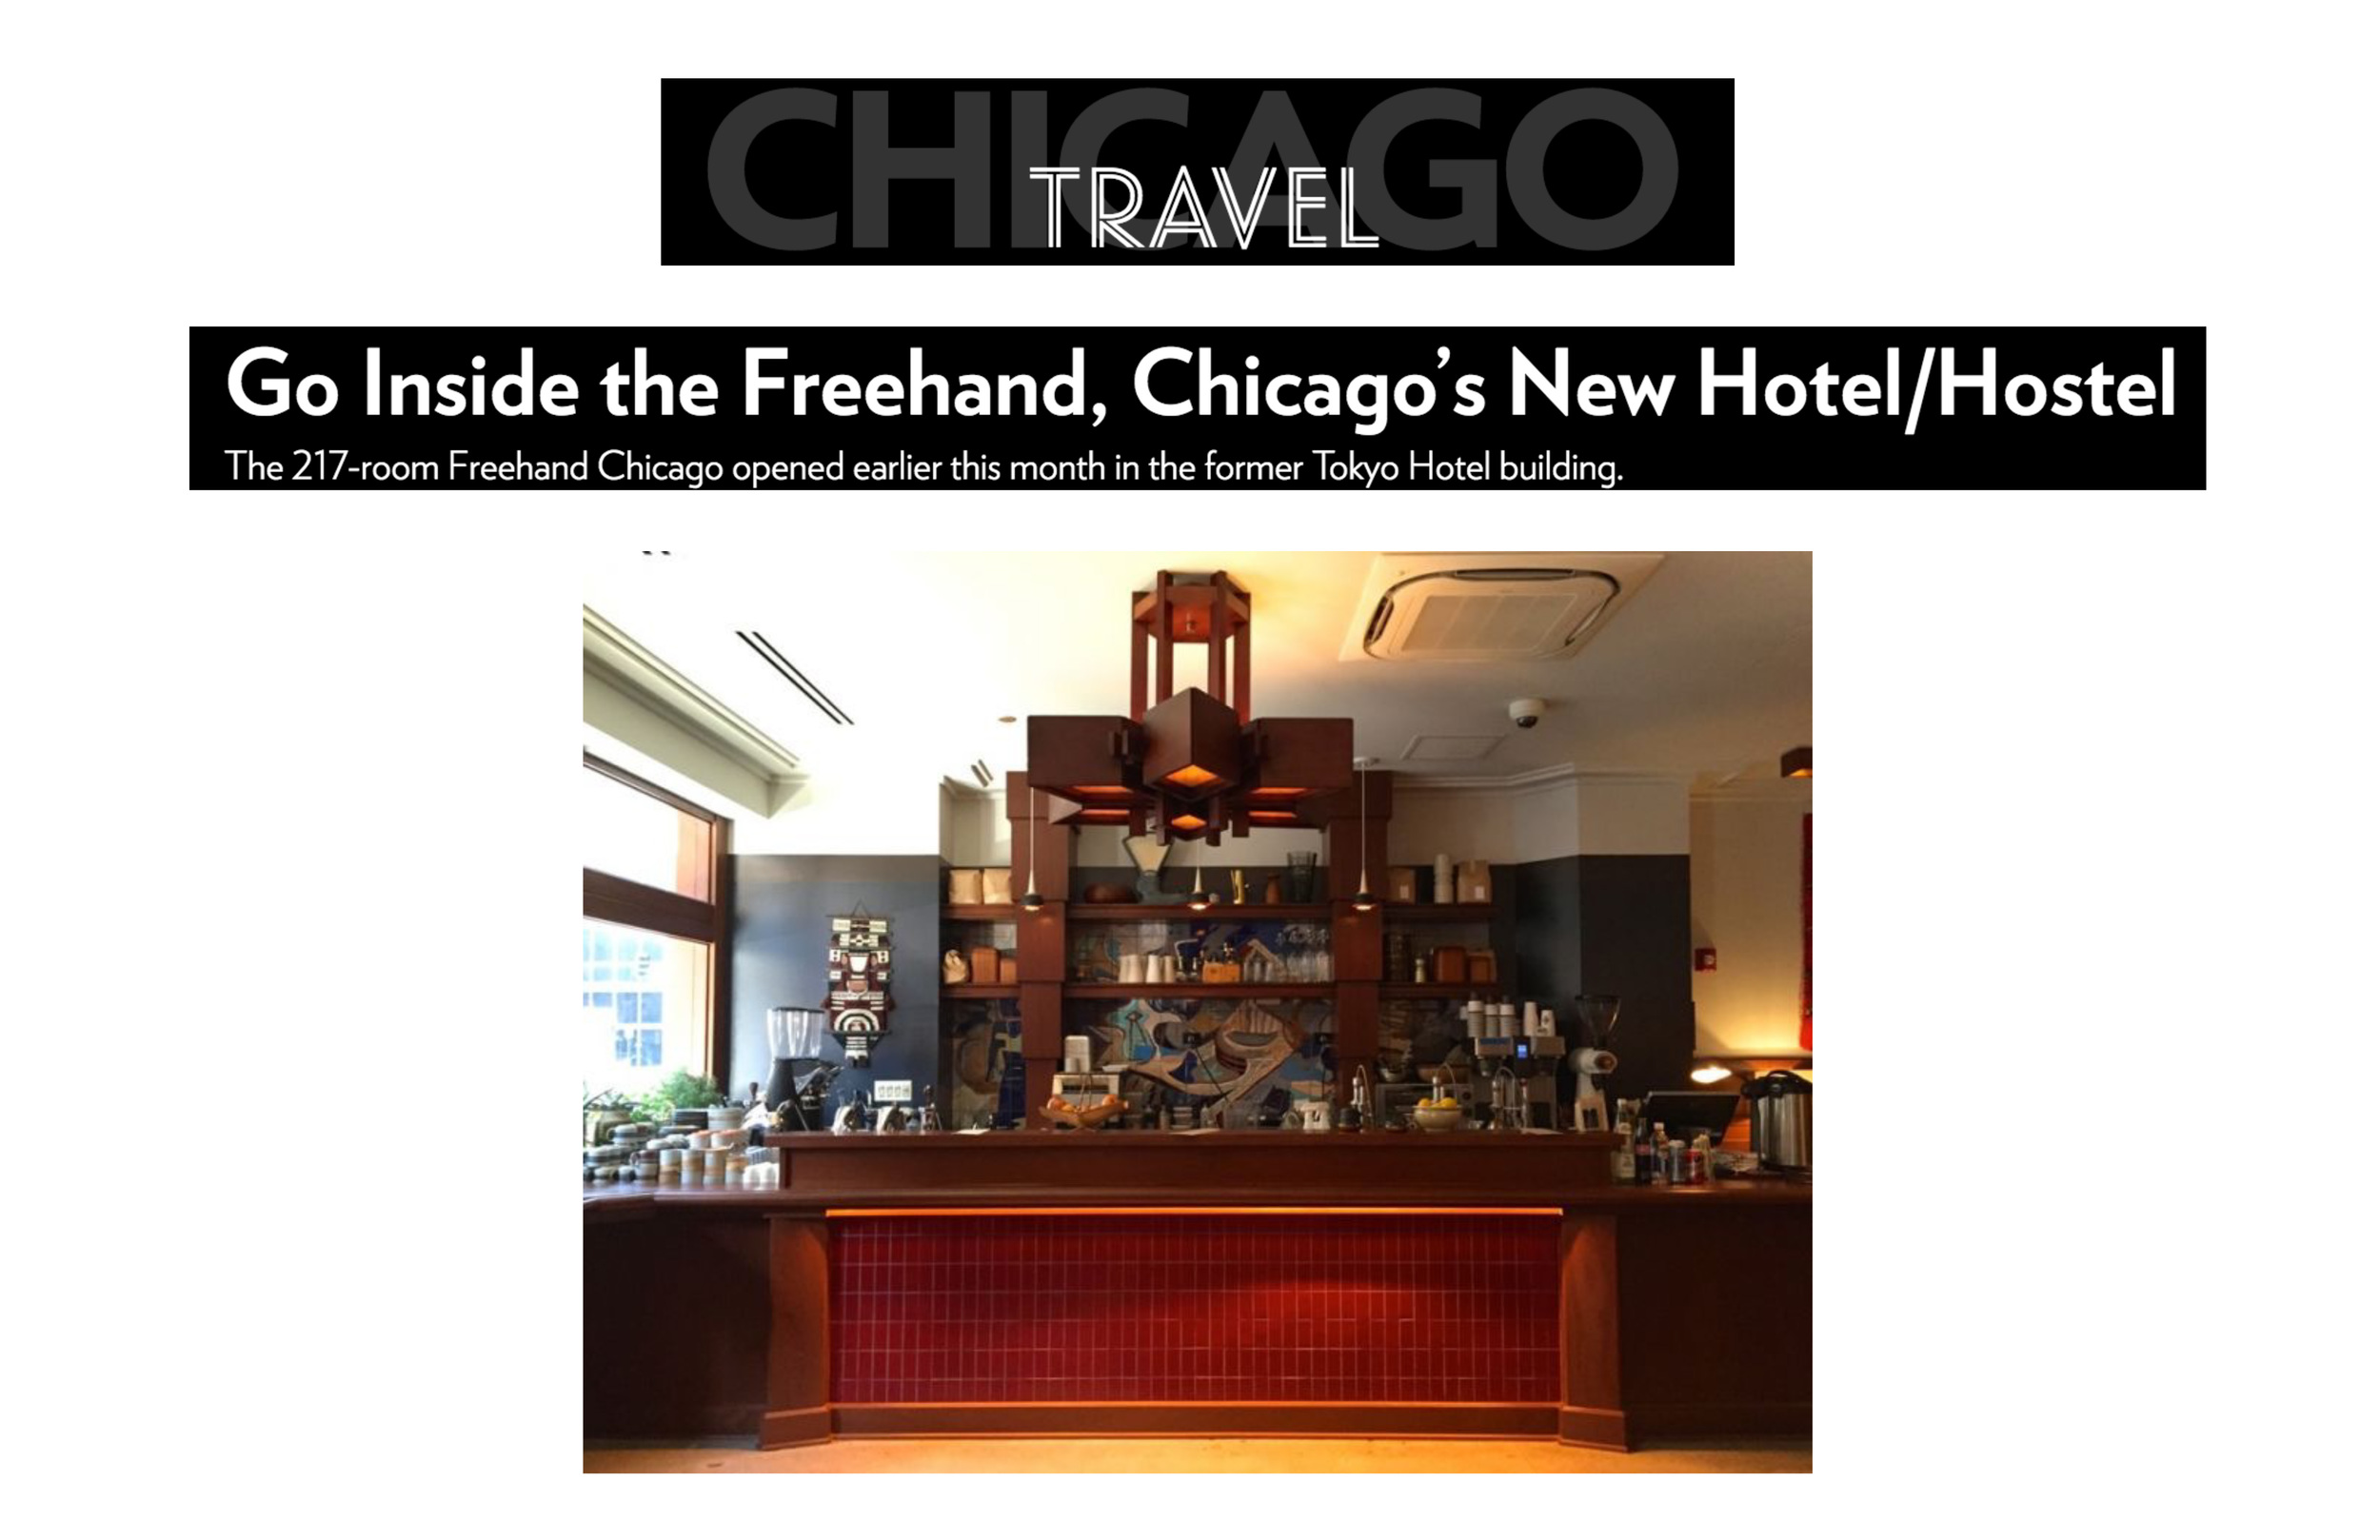 CHICAGO MAG TRAVEL MAY 2015